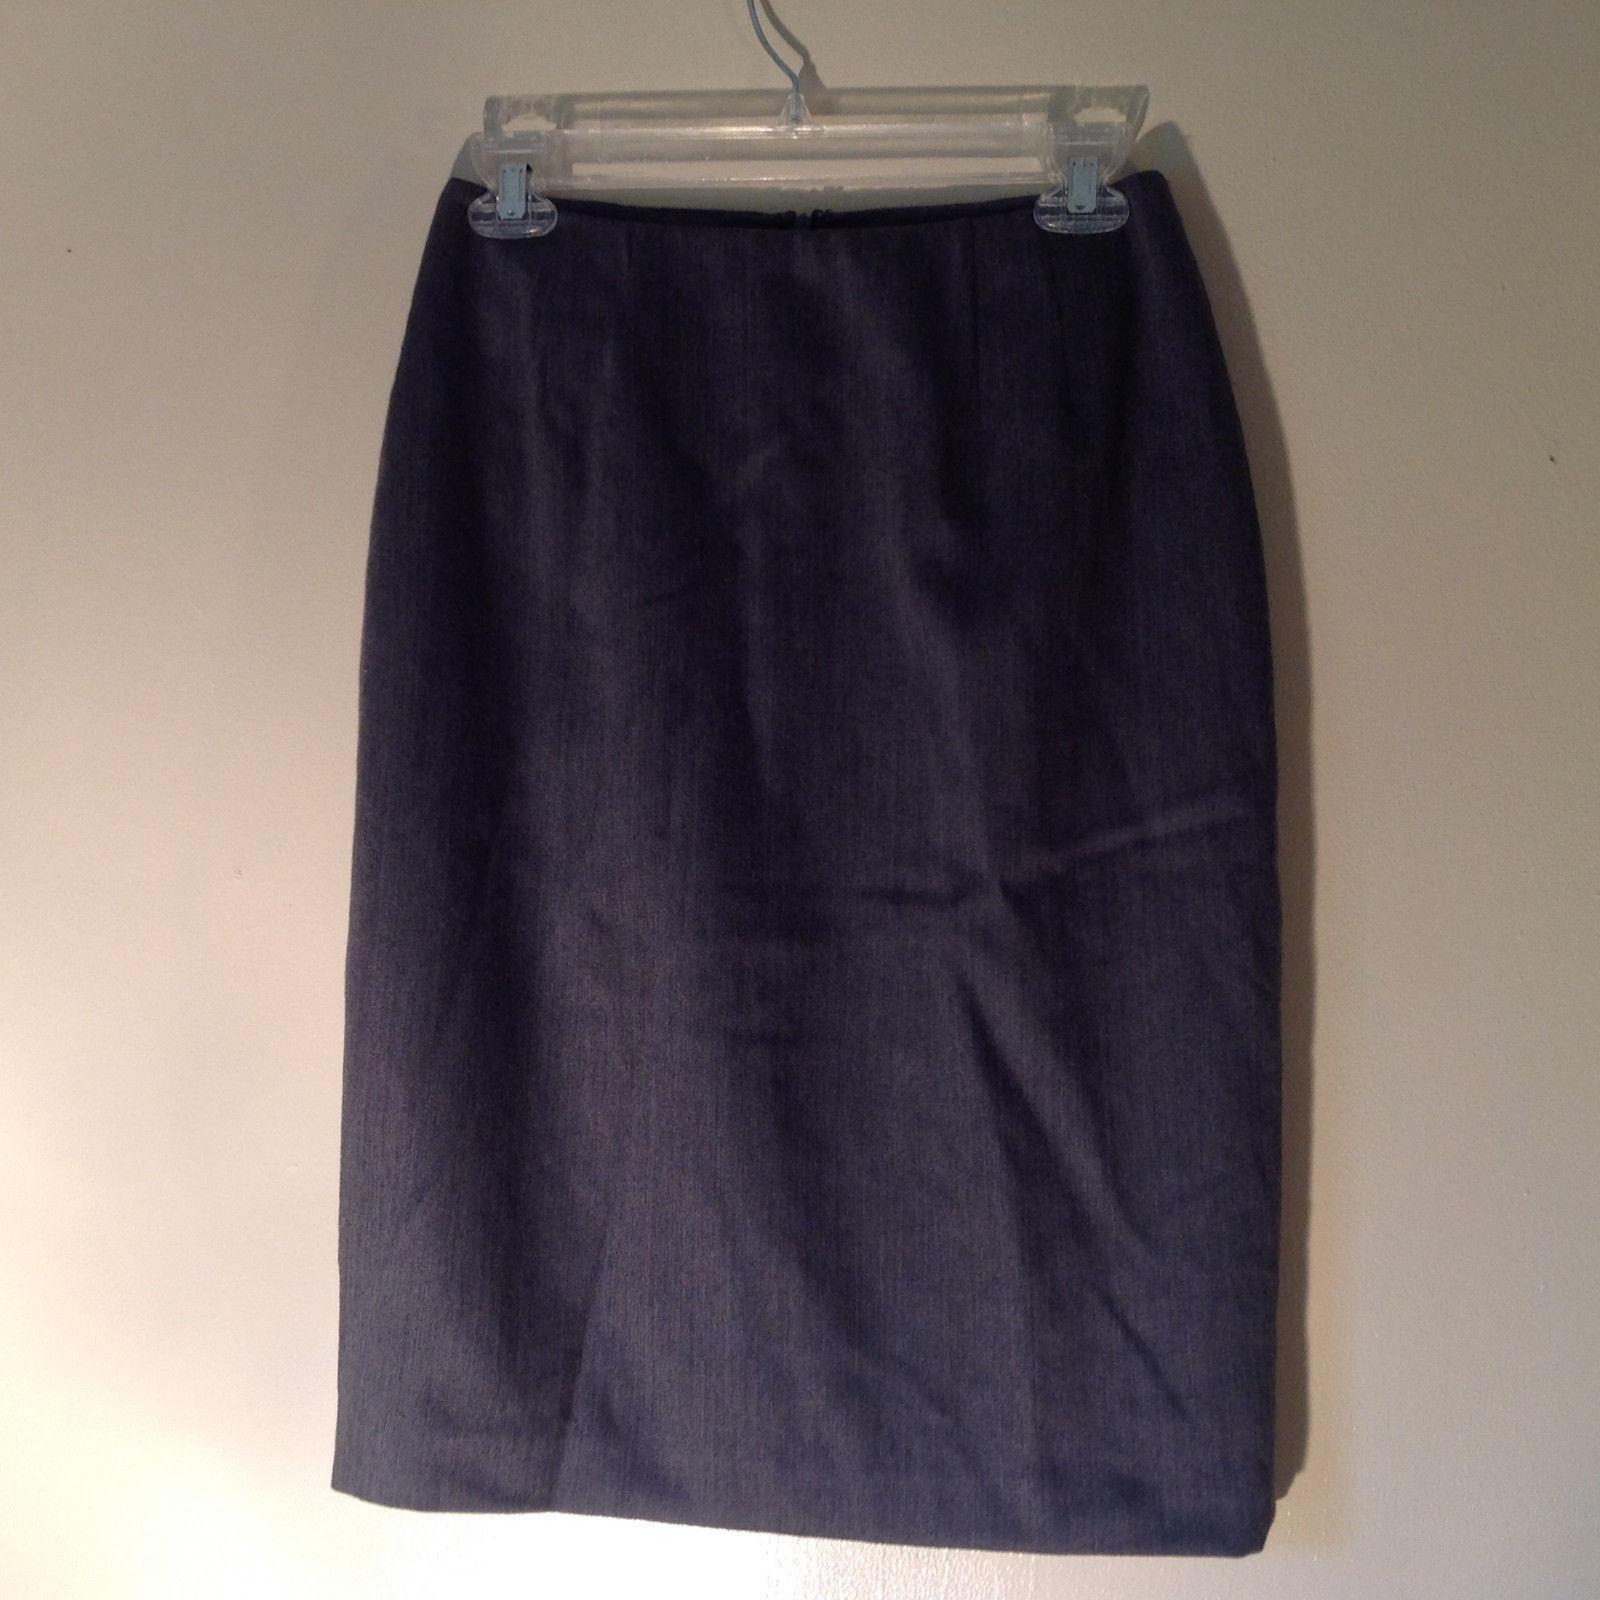 Linda Allard Ellen Tracy Gray Formal Skirt 100 Percent Wool Zipper Size 6